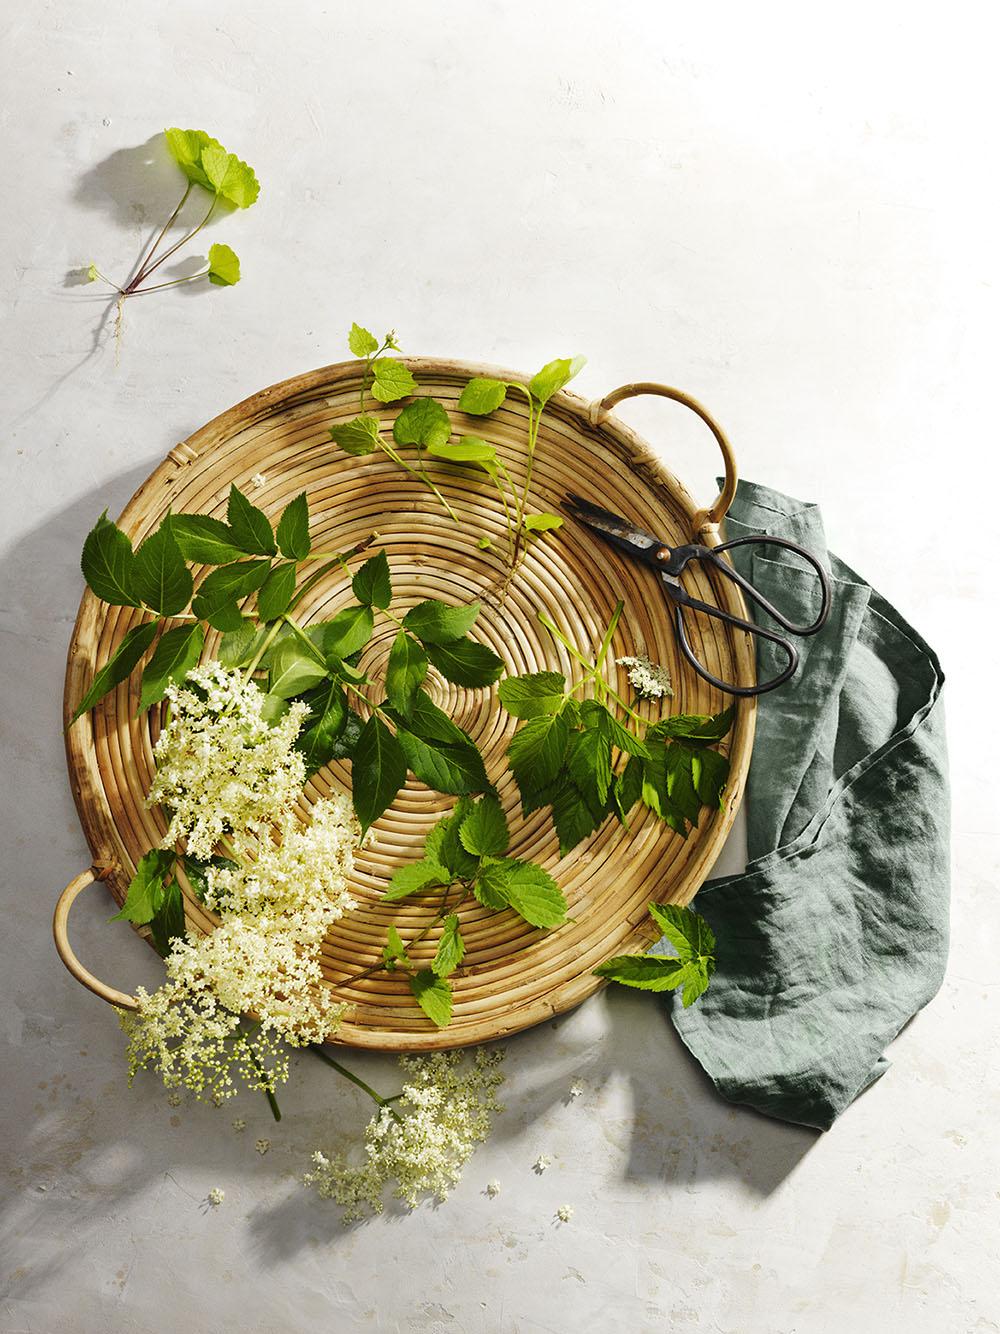 """Vilda växter"", styling & recept. Foto: Elin Sylwan"